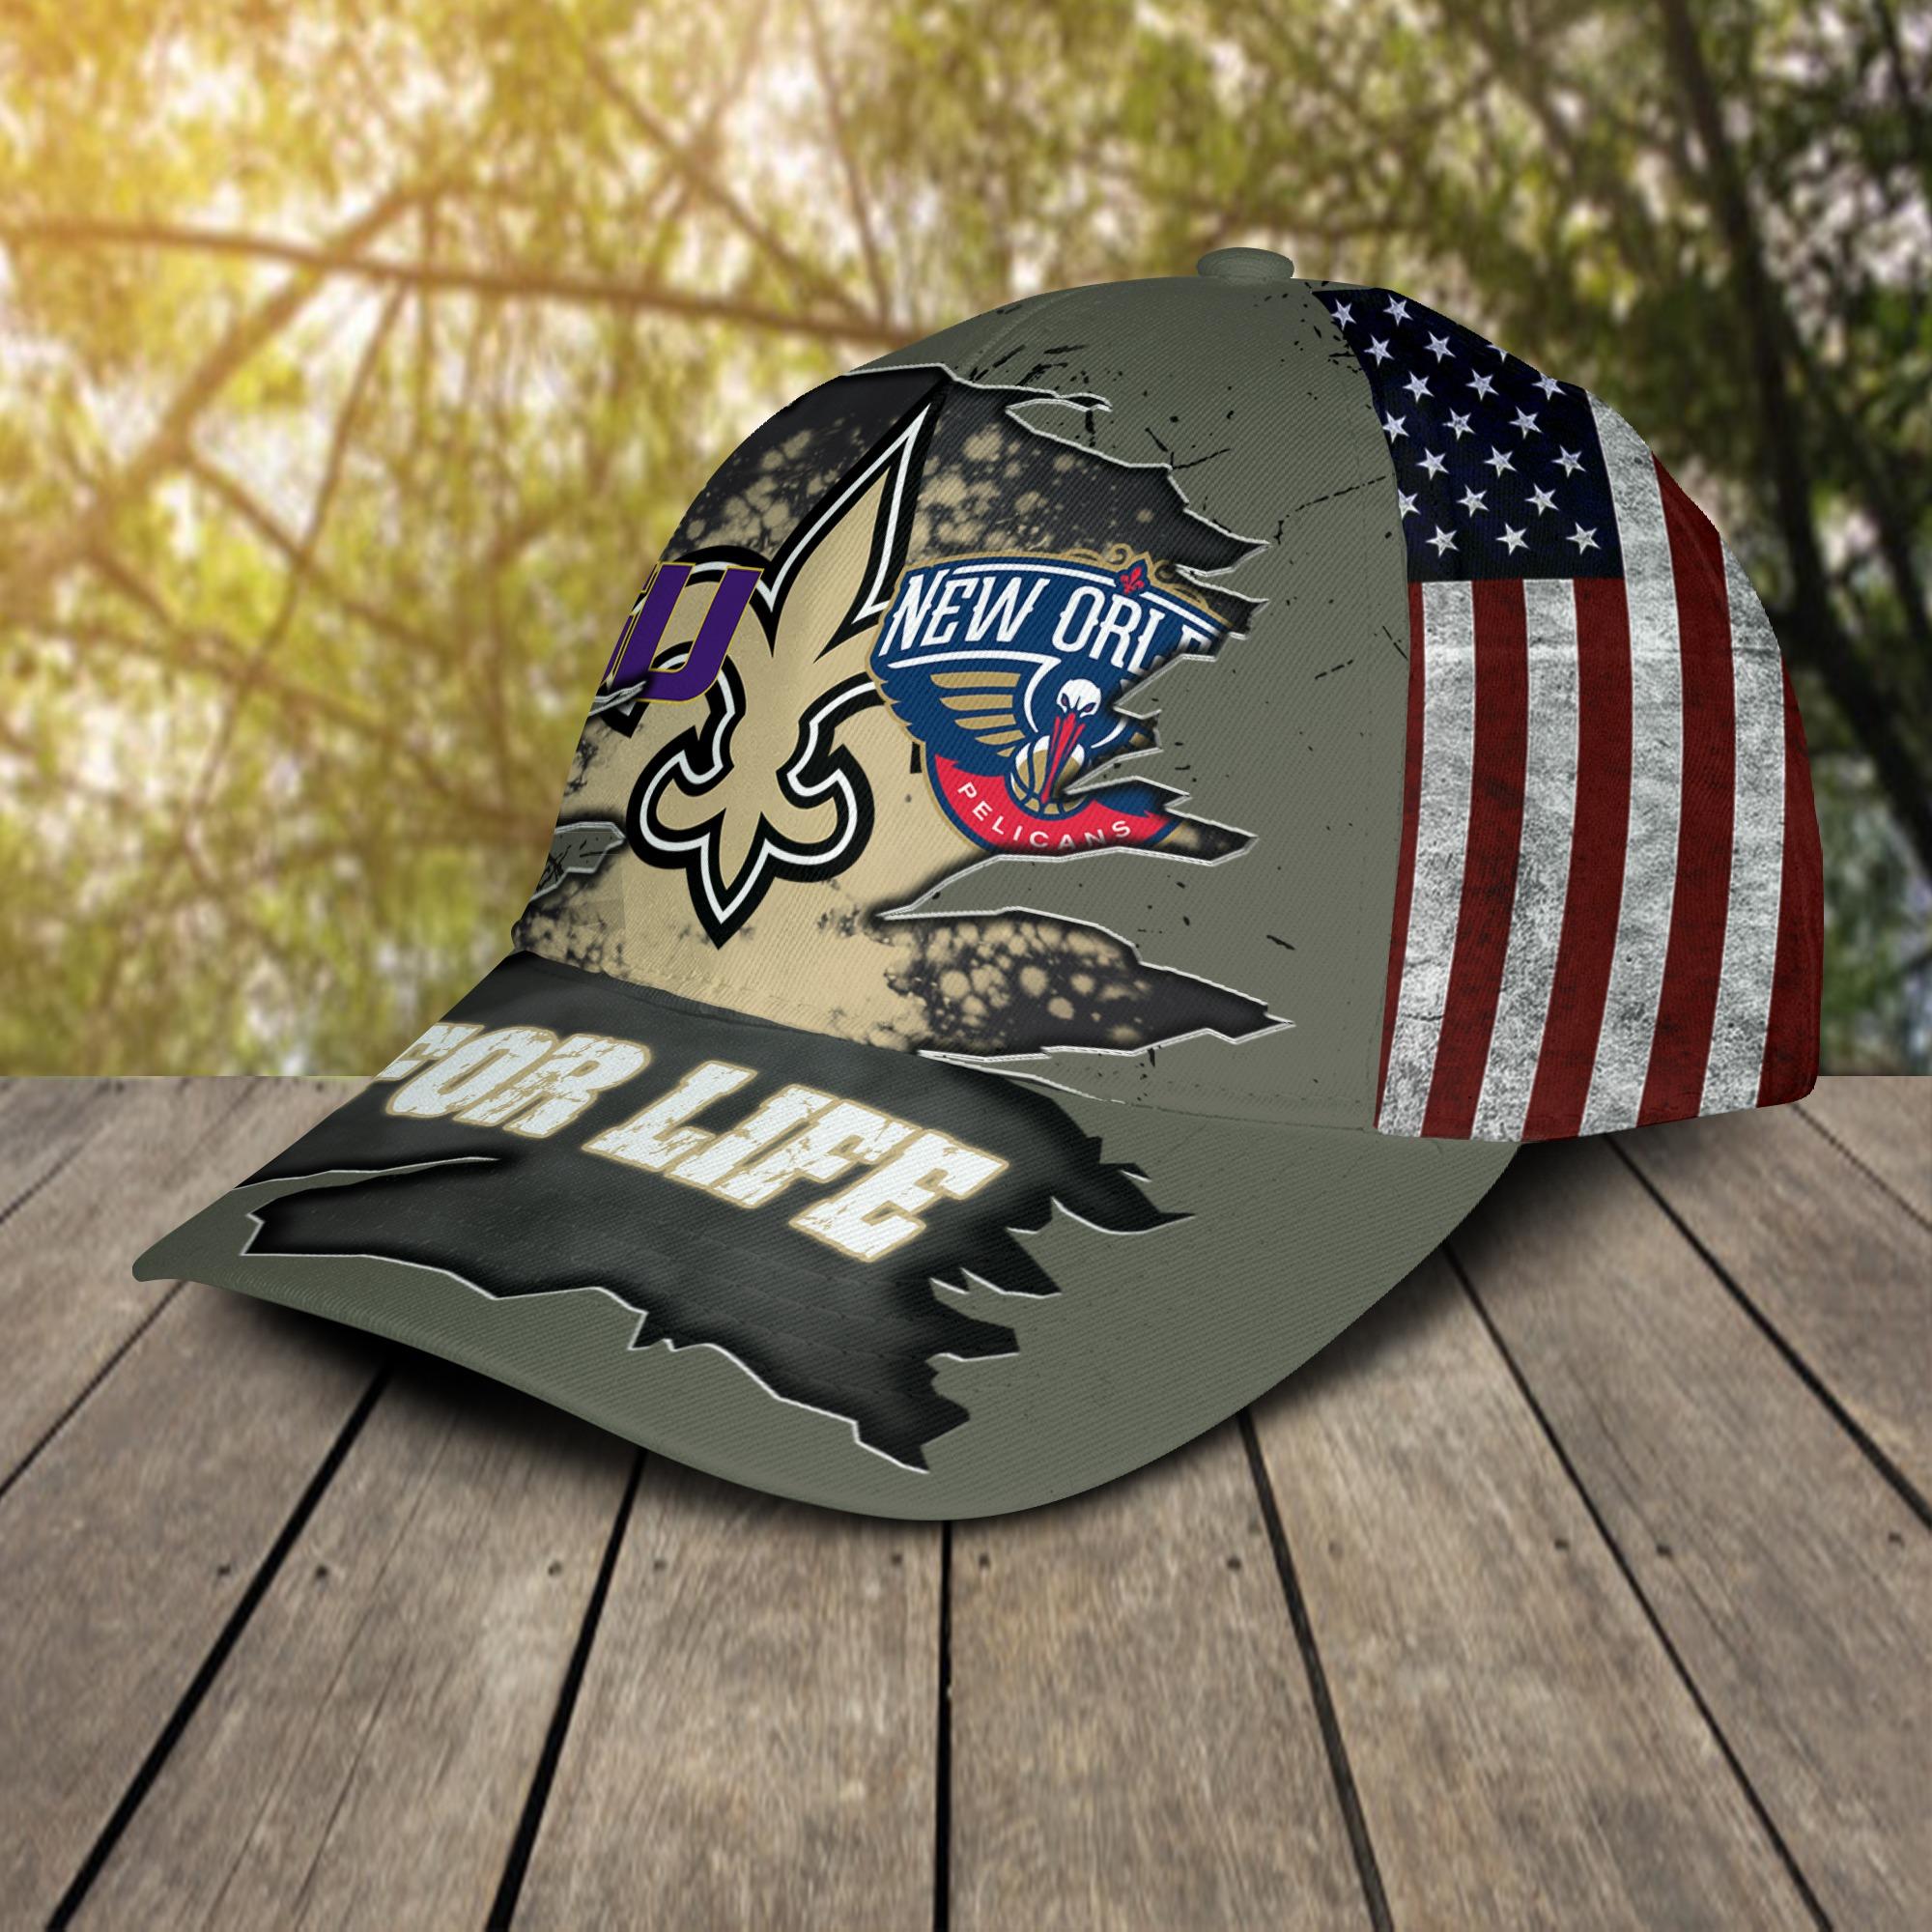 New Orleans Saints New Orleans Pelicans LSU Tigers For Life Cap 2